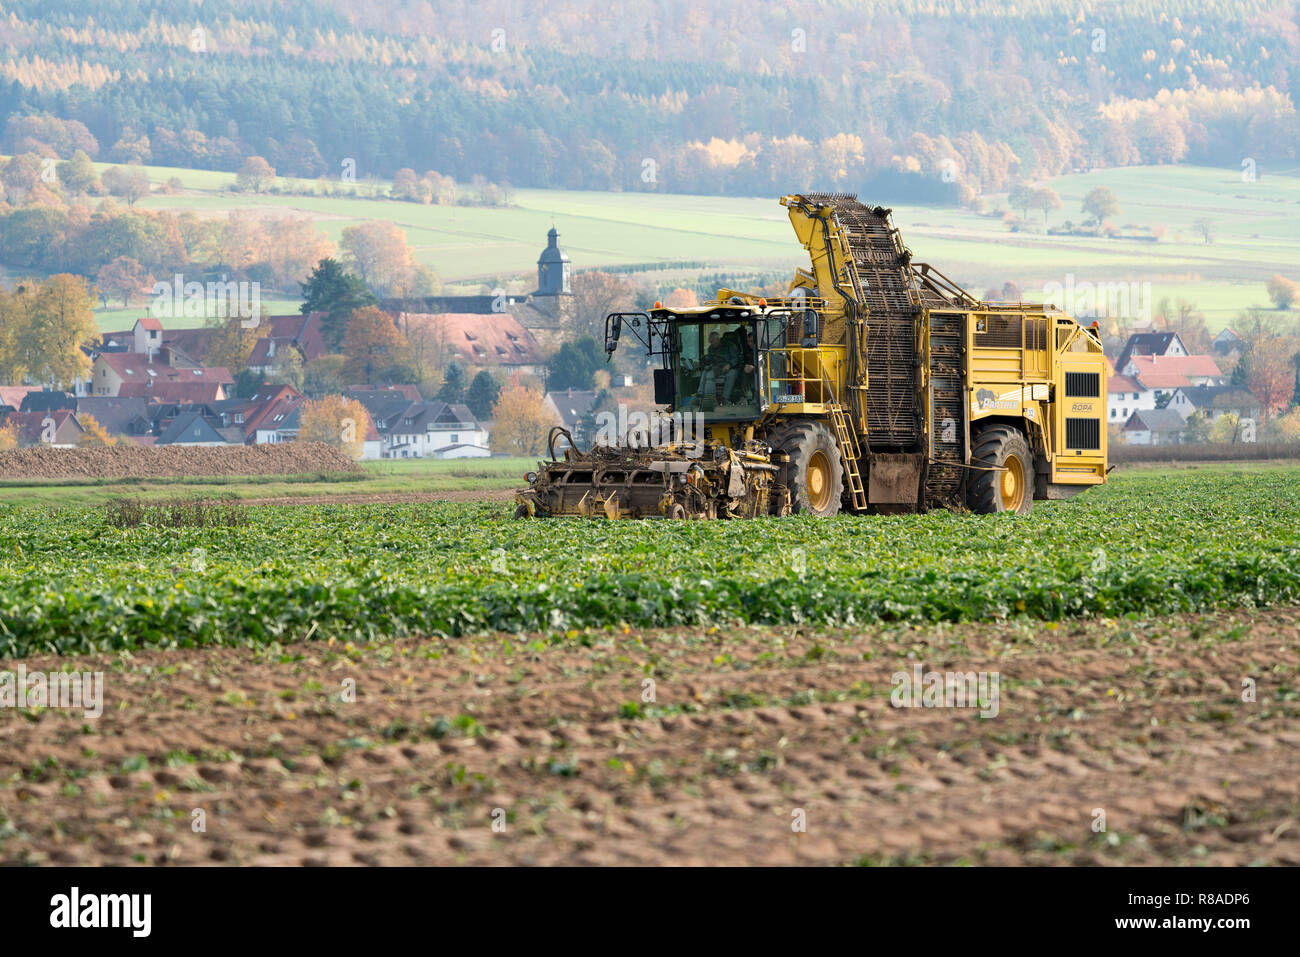 A Sugarbeet harvester, near Oberweser, Upper Weser Valley,  Weser Uplands, Weserbergland, Hesse, Germany Stock Photo